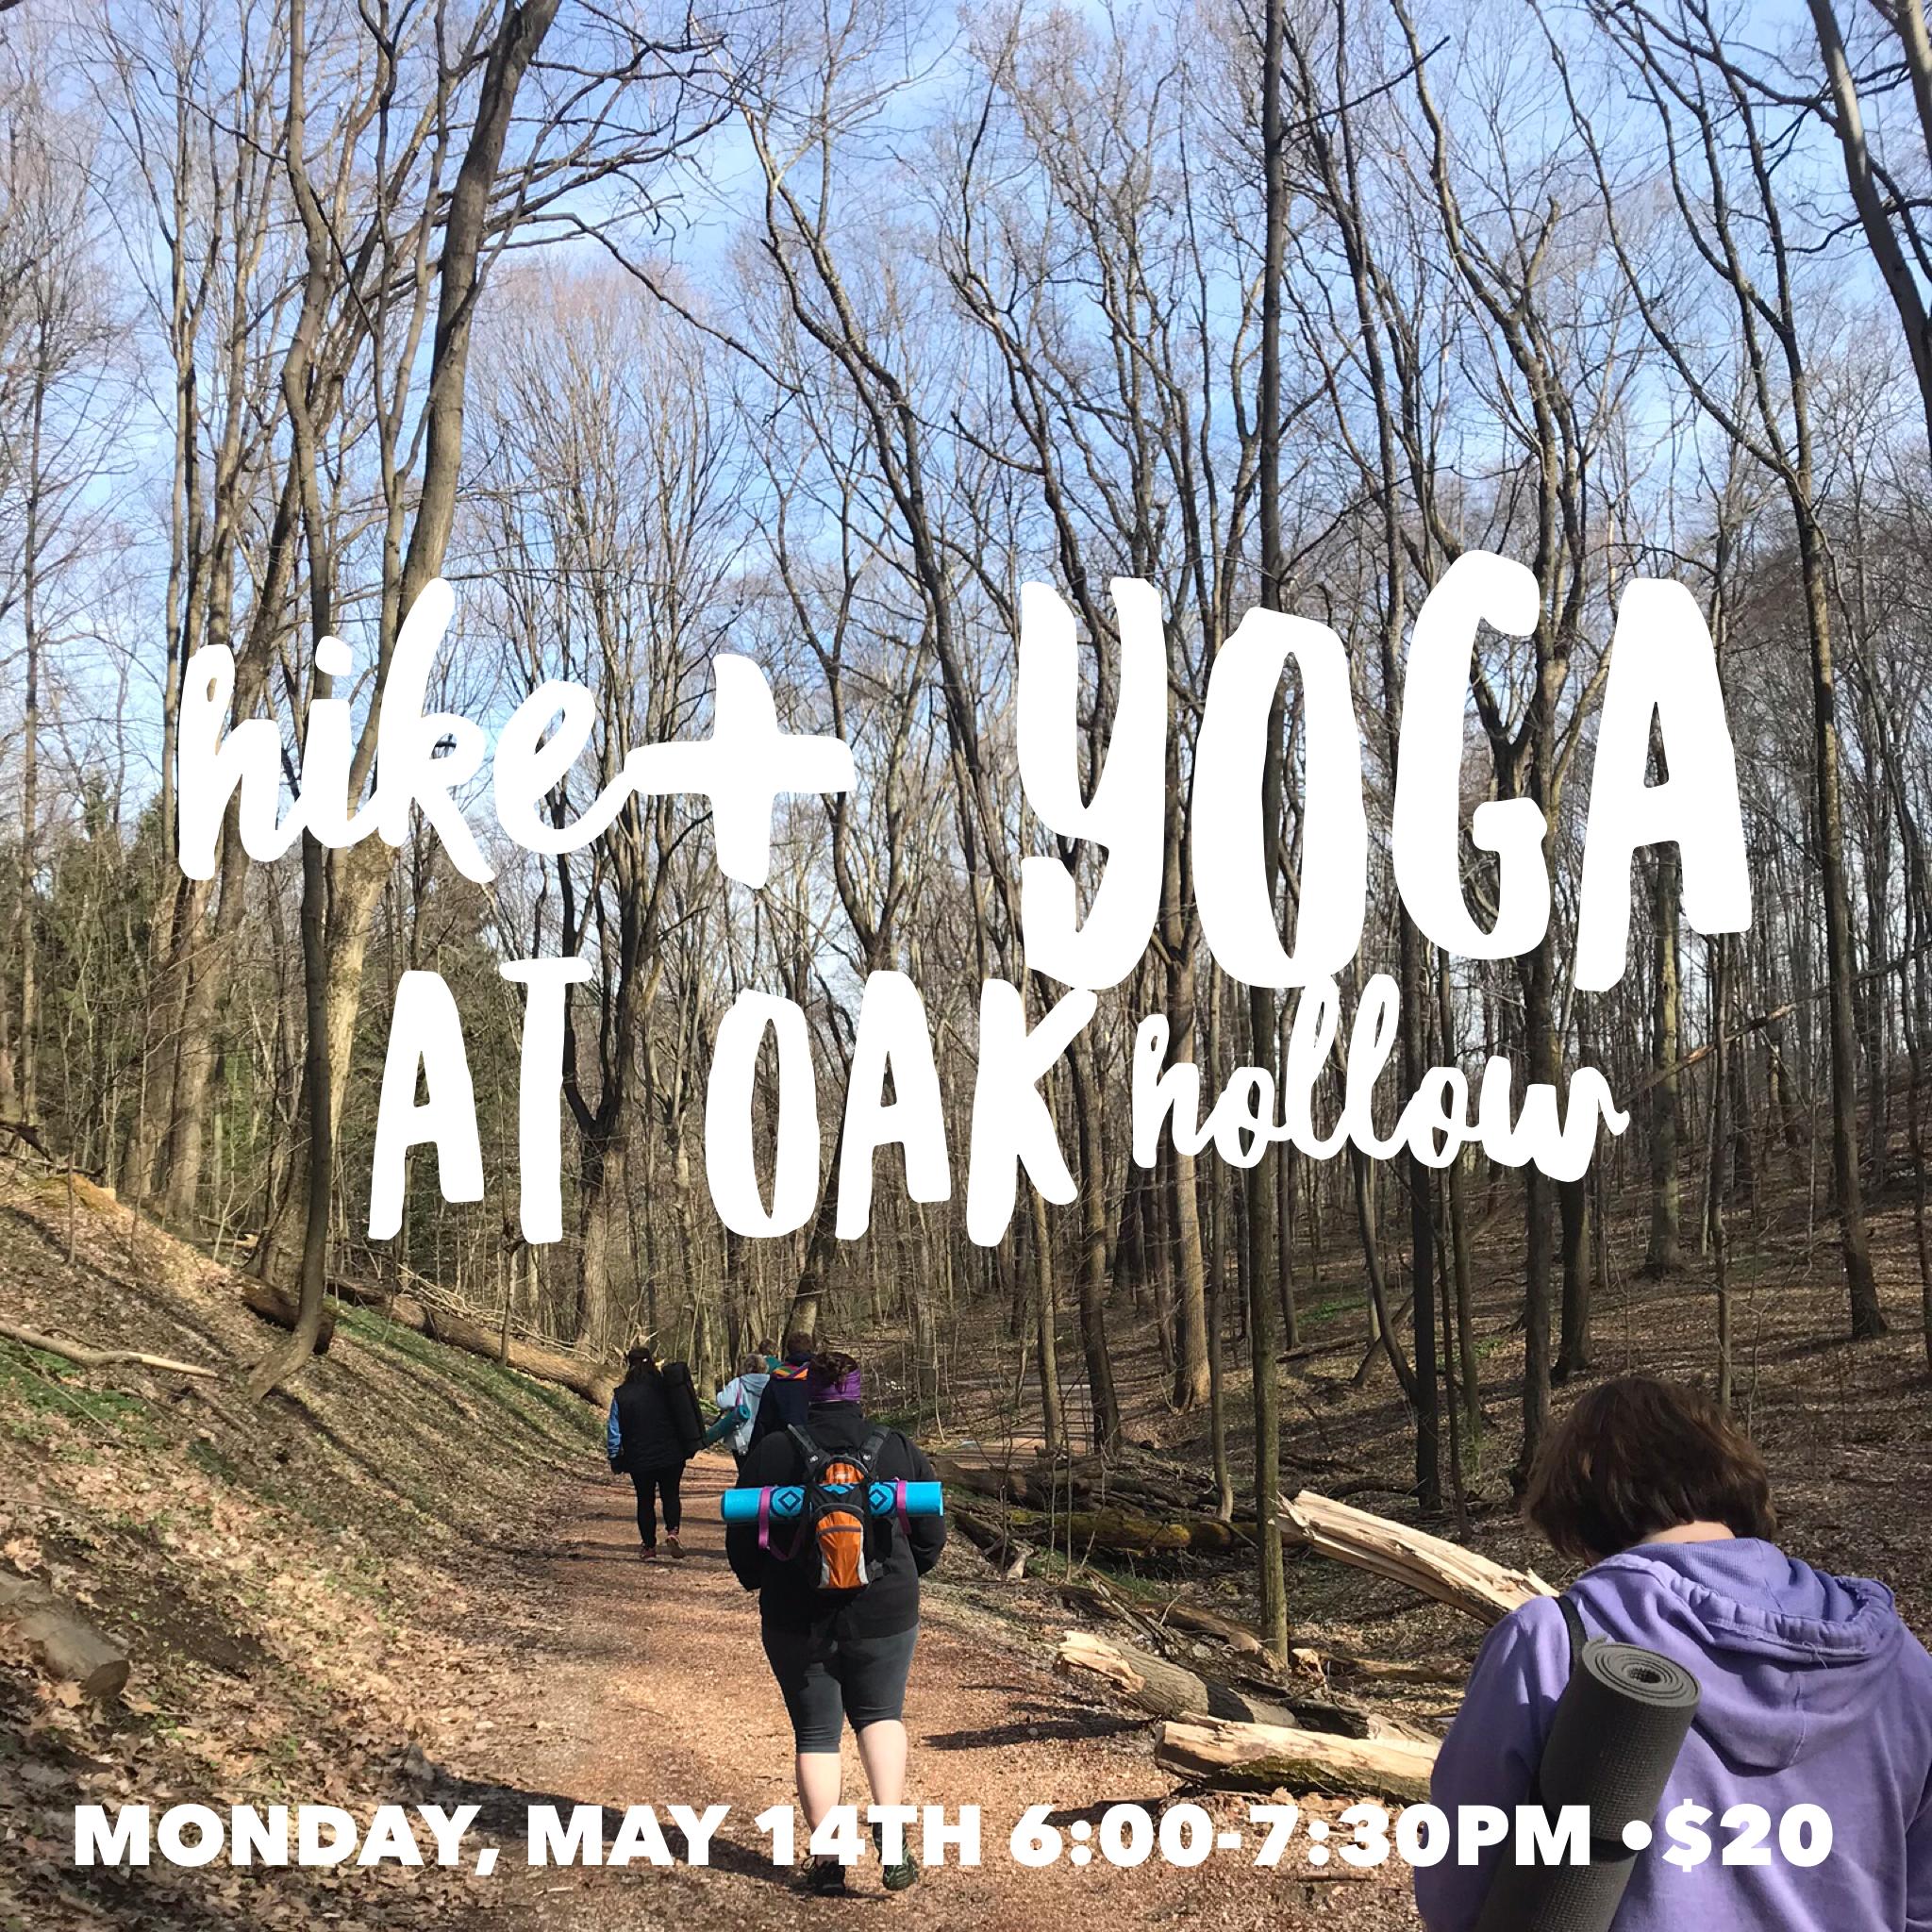 Hike & Yoga at Oak Hollow Park in Irwin